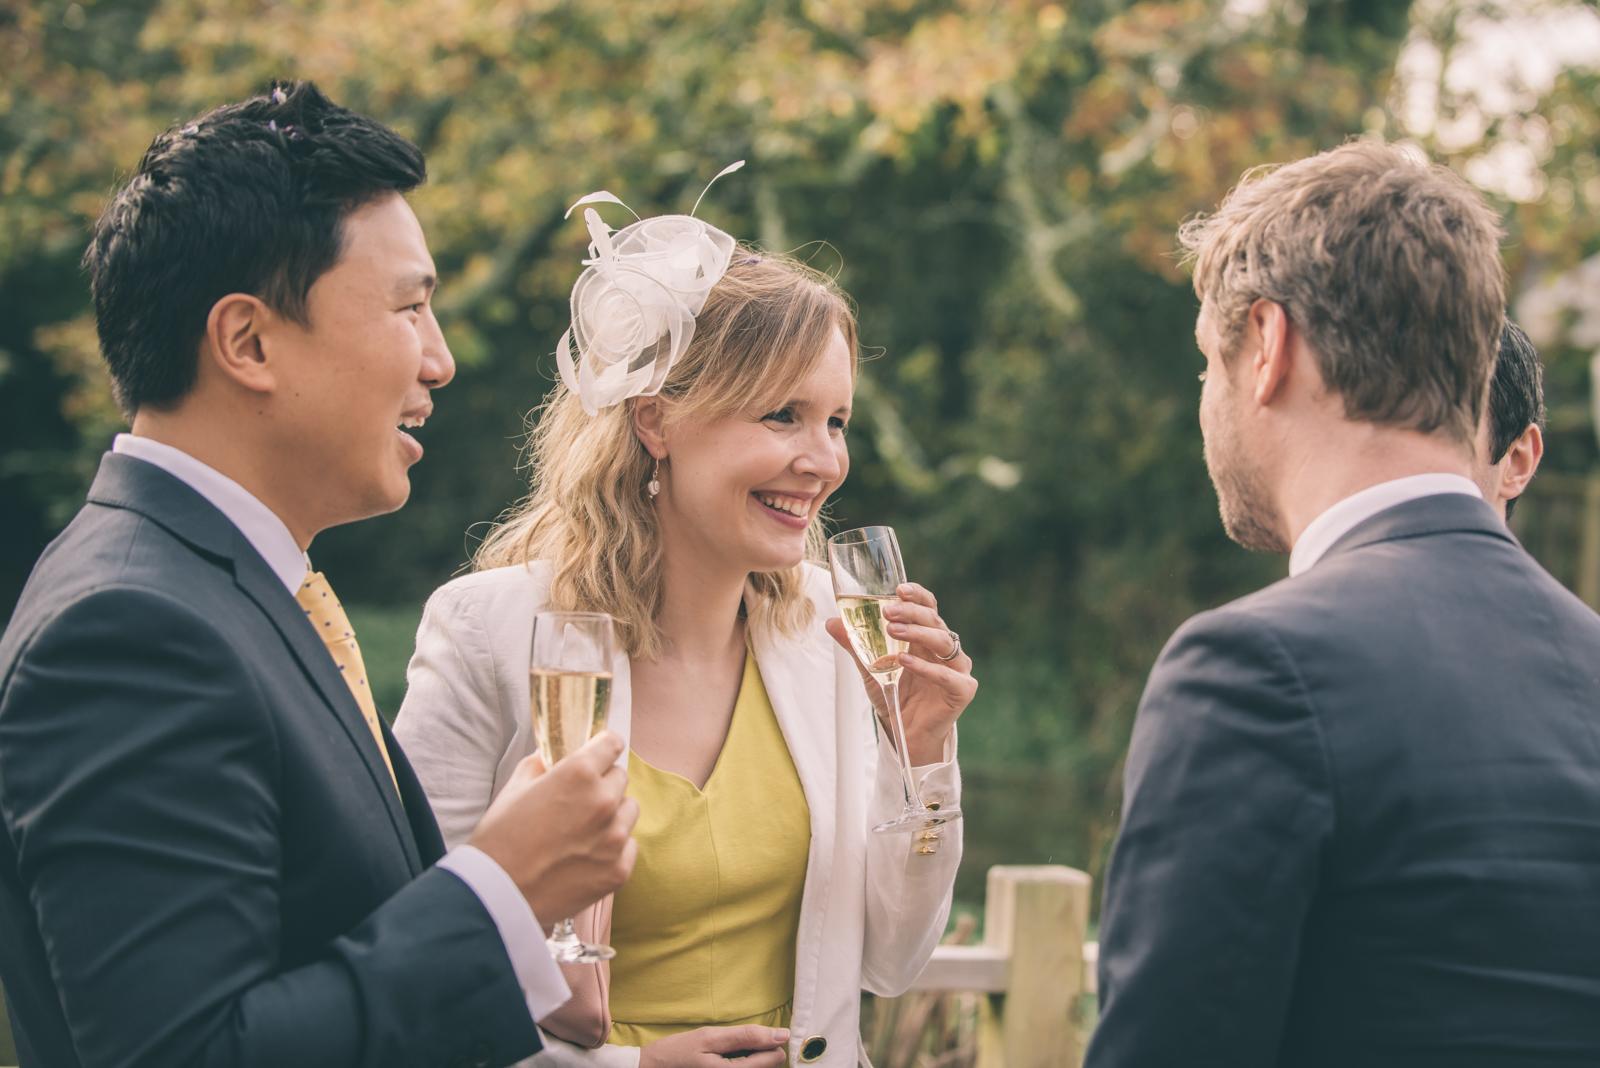 nancarrow-wedding-photography-105.jpg